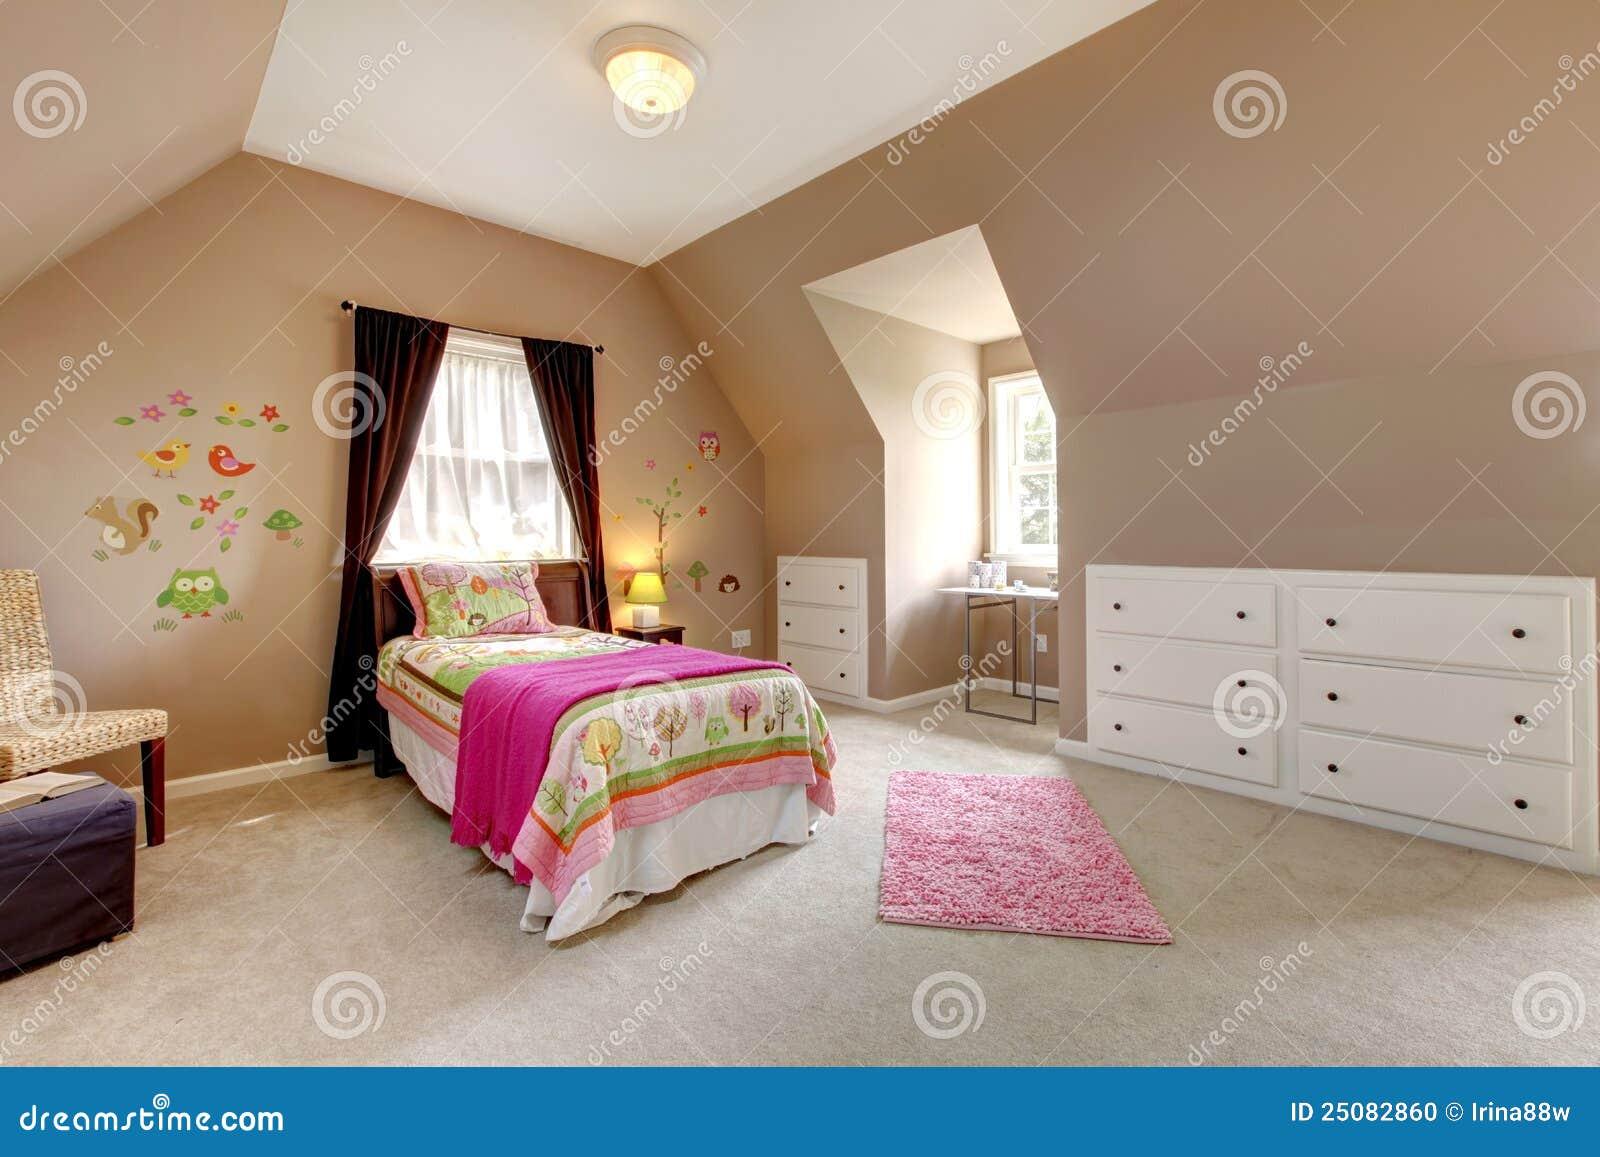 Chambre coucher simple photos – 4,290 chambre coucher simple ...